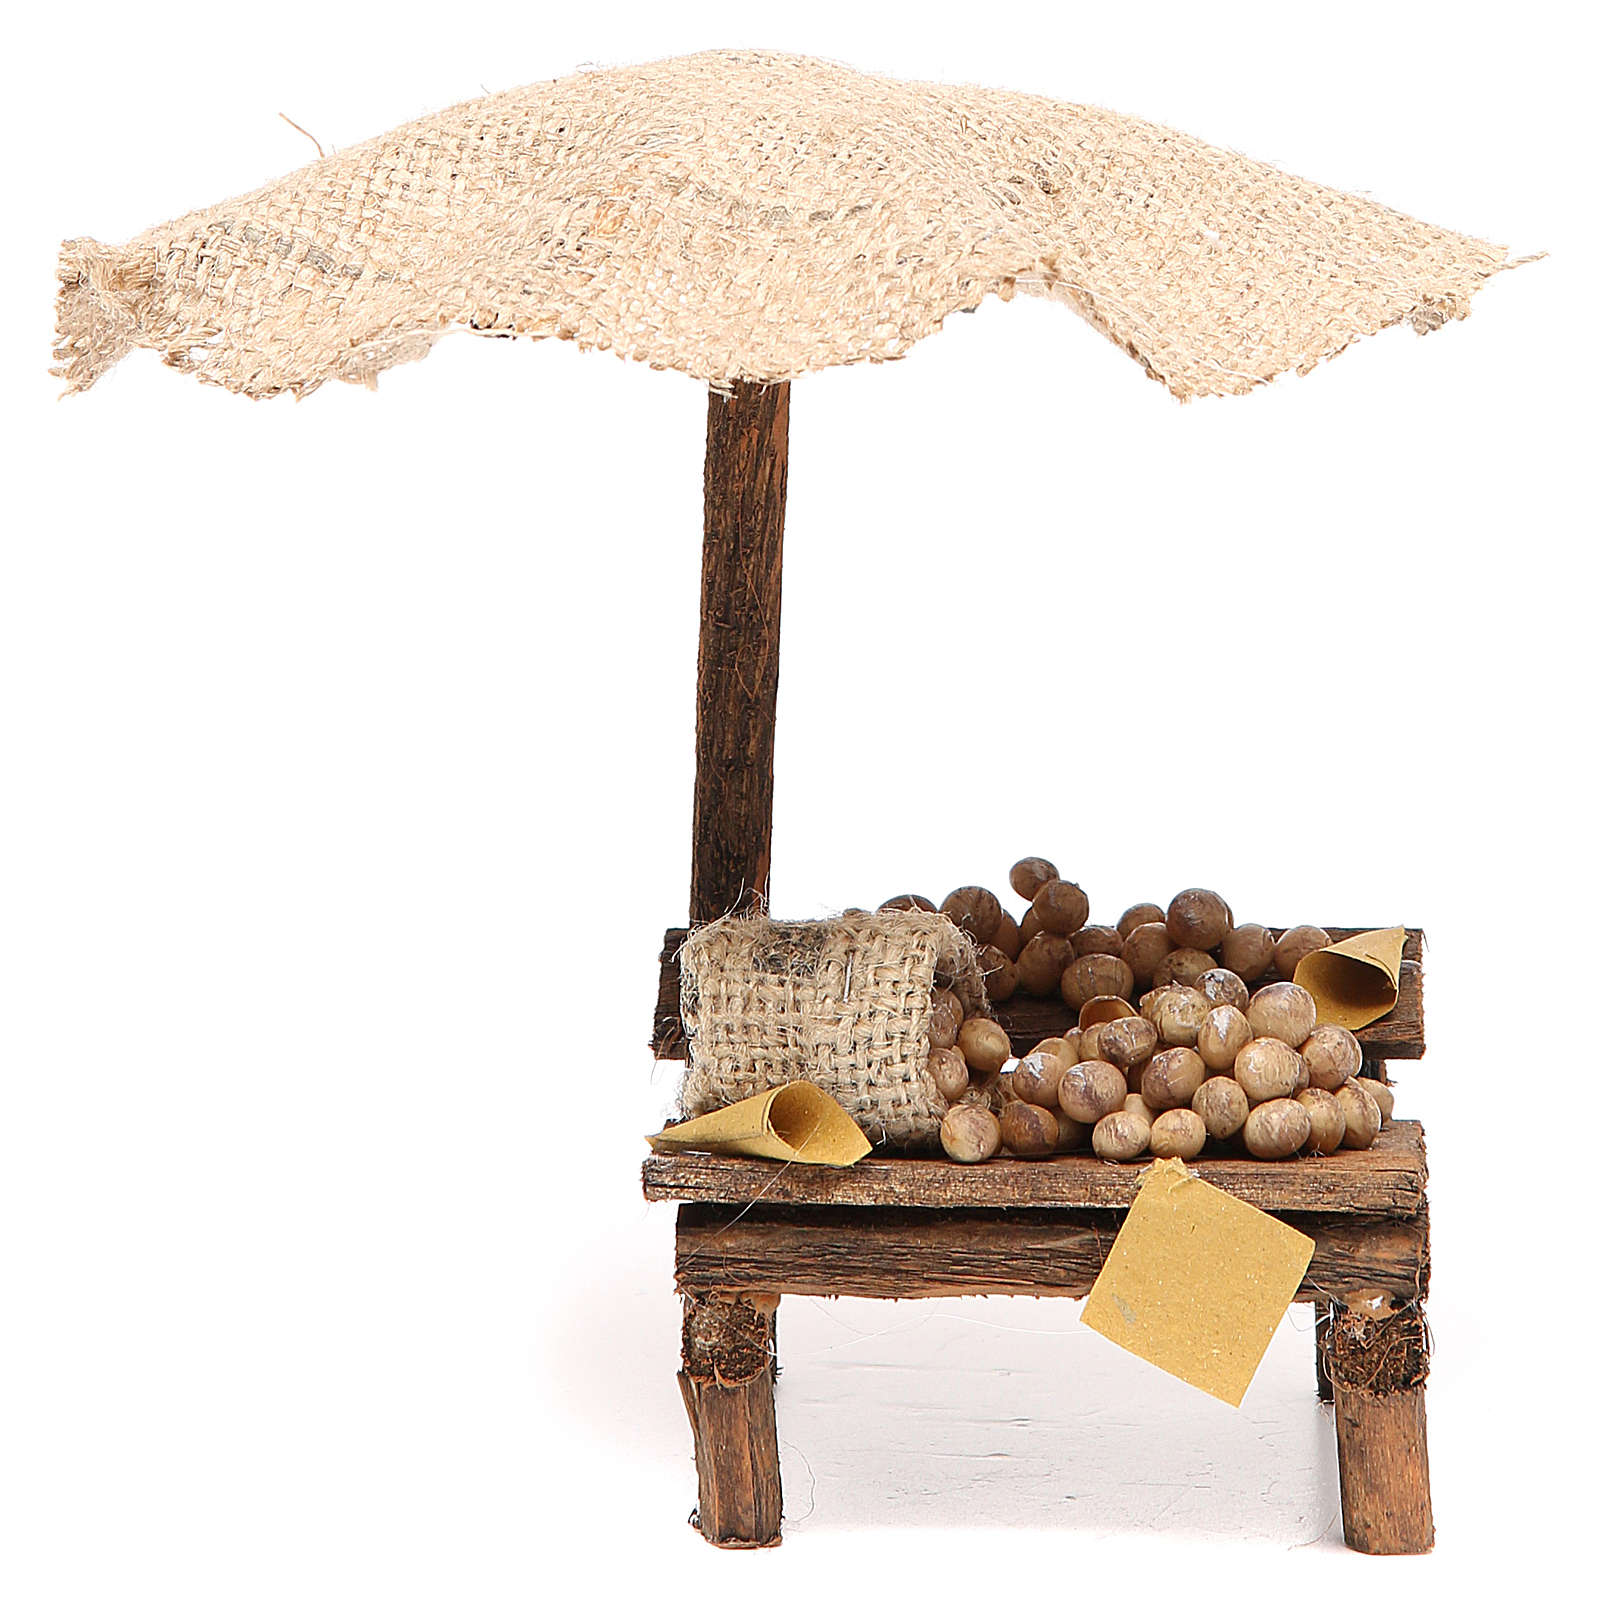 Nativity Bench with eggs and beach umbrella 16x10x12cm 4